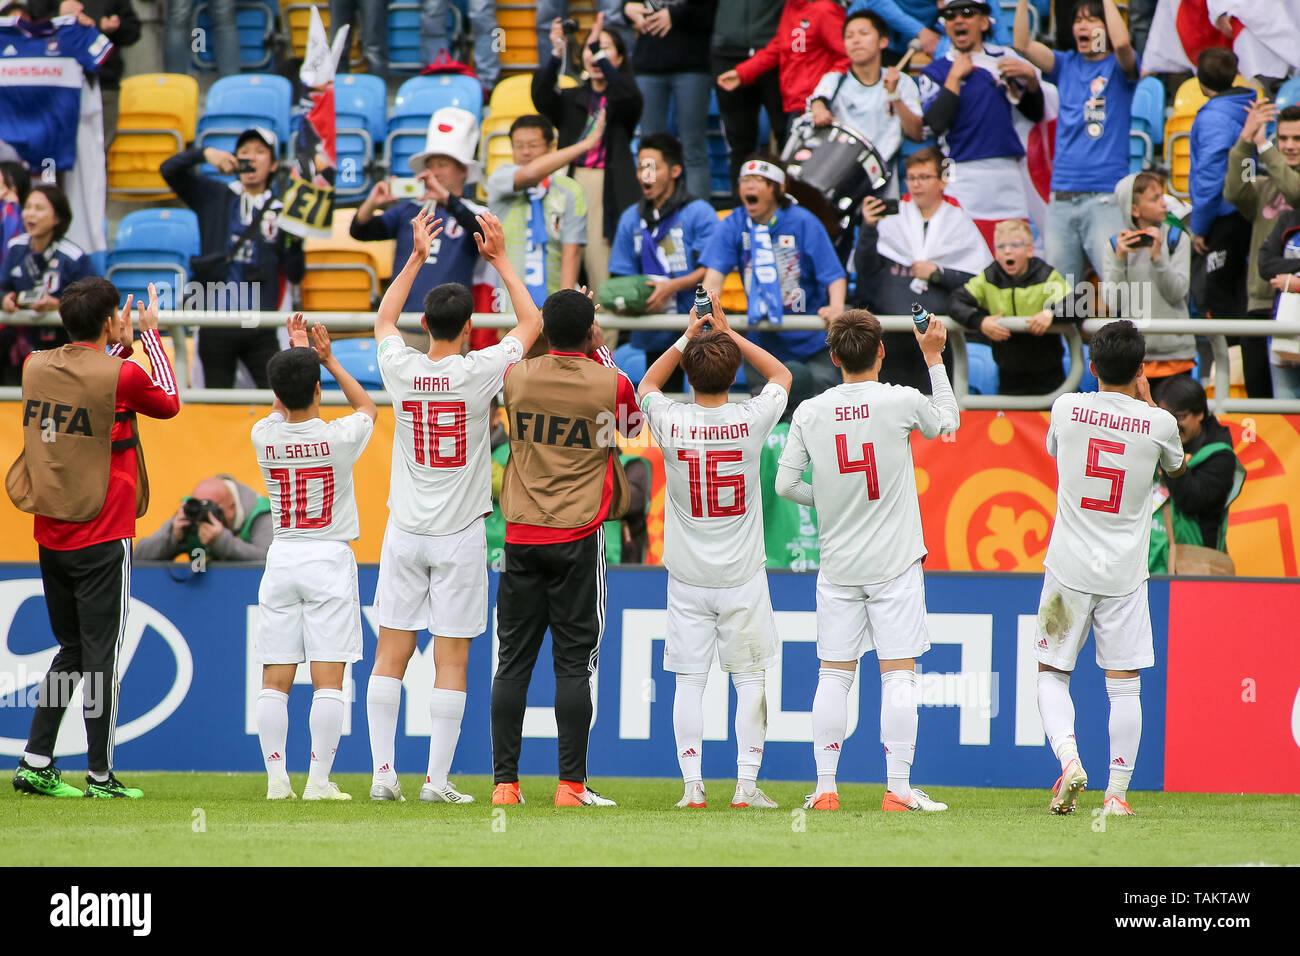 Gdynia Stadium, Gdynia, Poland - 26th May, 2019: Mitsuki Saito (c), Taichi Hara, Kota Yamada, Ayumu Seko, Yukinari Sugawara from Japan are seen thanking Japan fans after FIFA U-20 World Cup match between Mexico and Japan (GROUP B) in Gdynia. (Final score; Mexico 0:3 Japan) - Stock Image